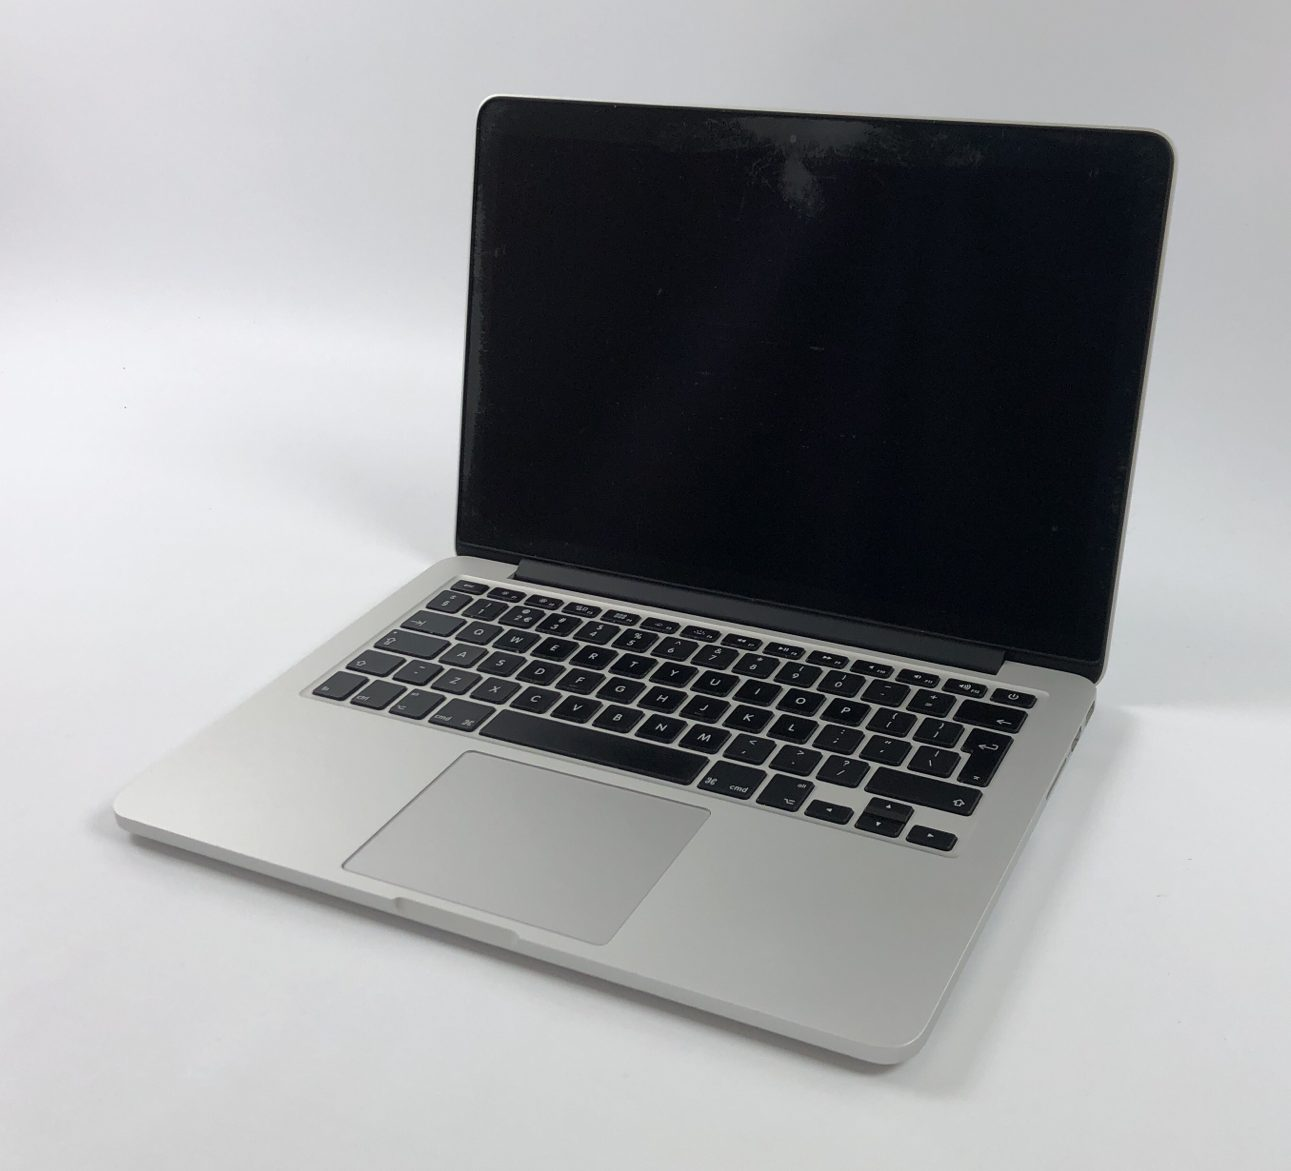 "MacBook Pro Retina 13"" Early 2015 (Intel Core i5 2.7 GHz 16 GB RAM 256 GB SSD), Intel Core i5 2.7 GHz, 16 GB RAM, 256 GB SSD, Afbeelding 1"